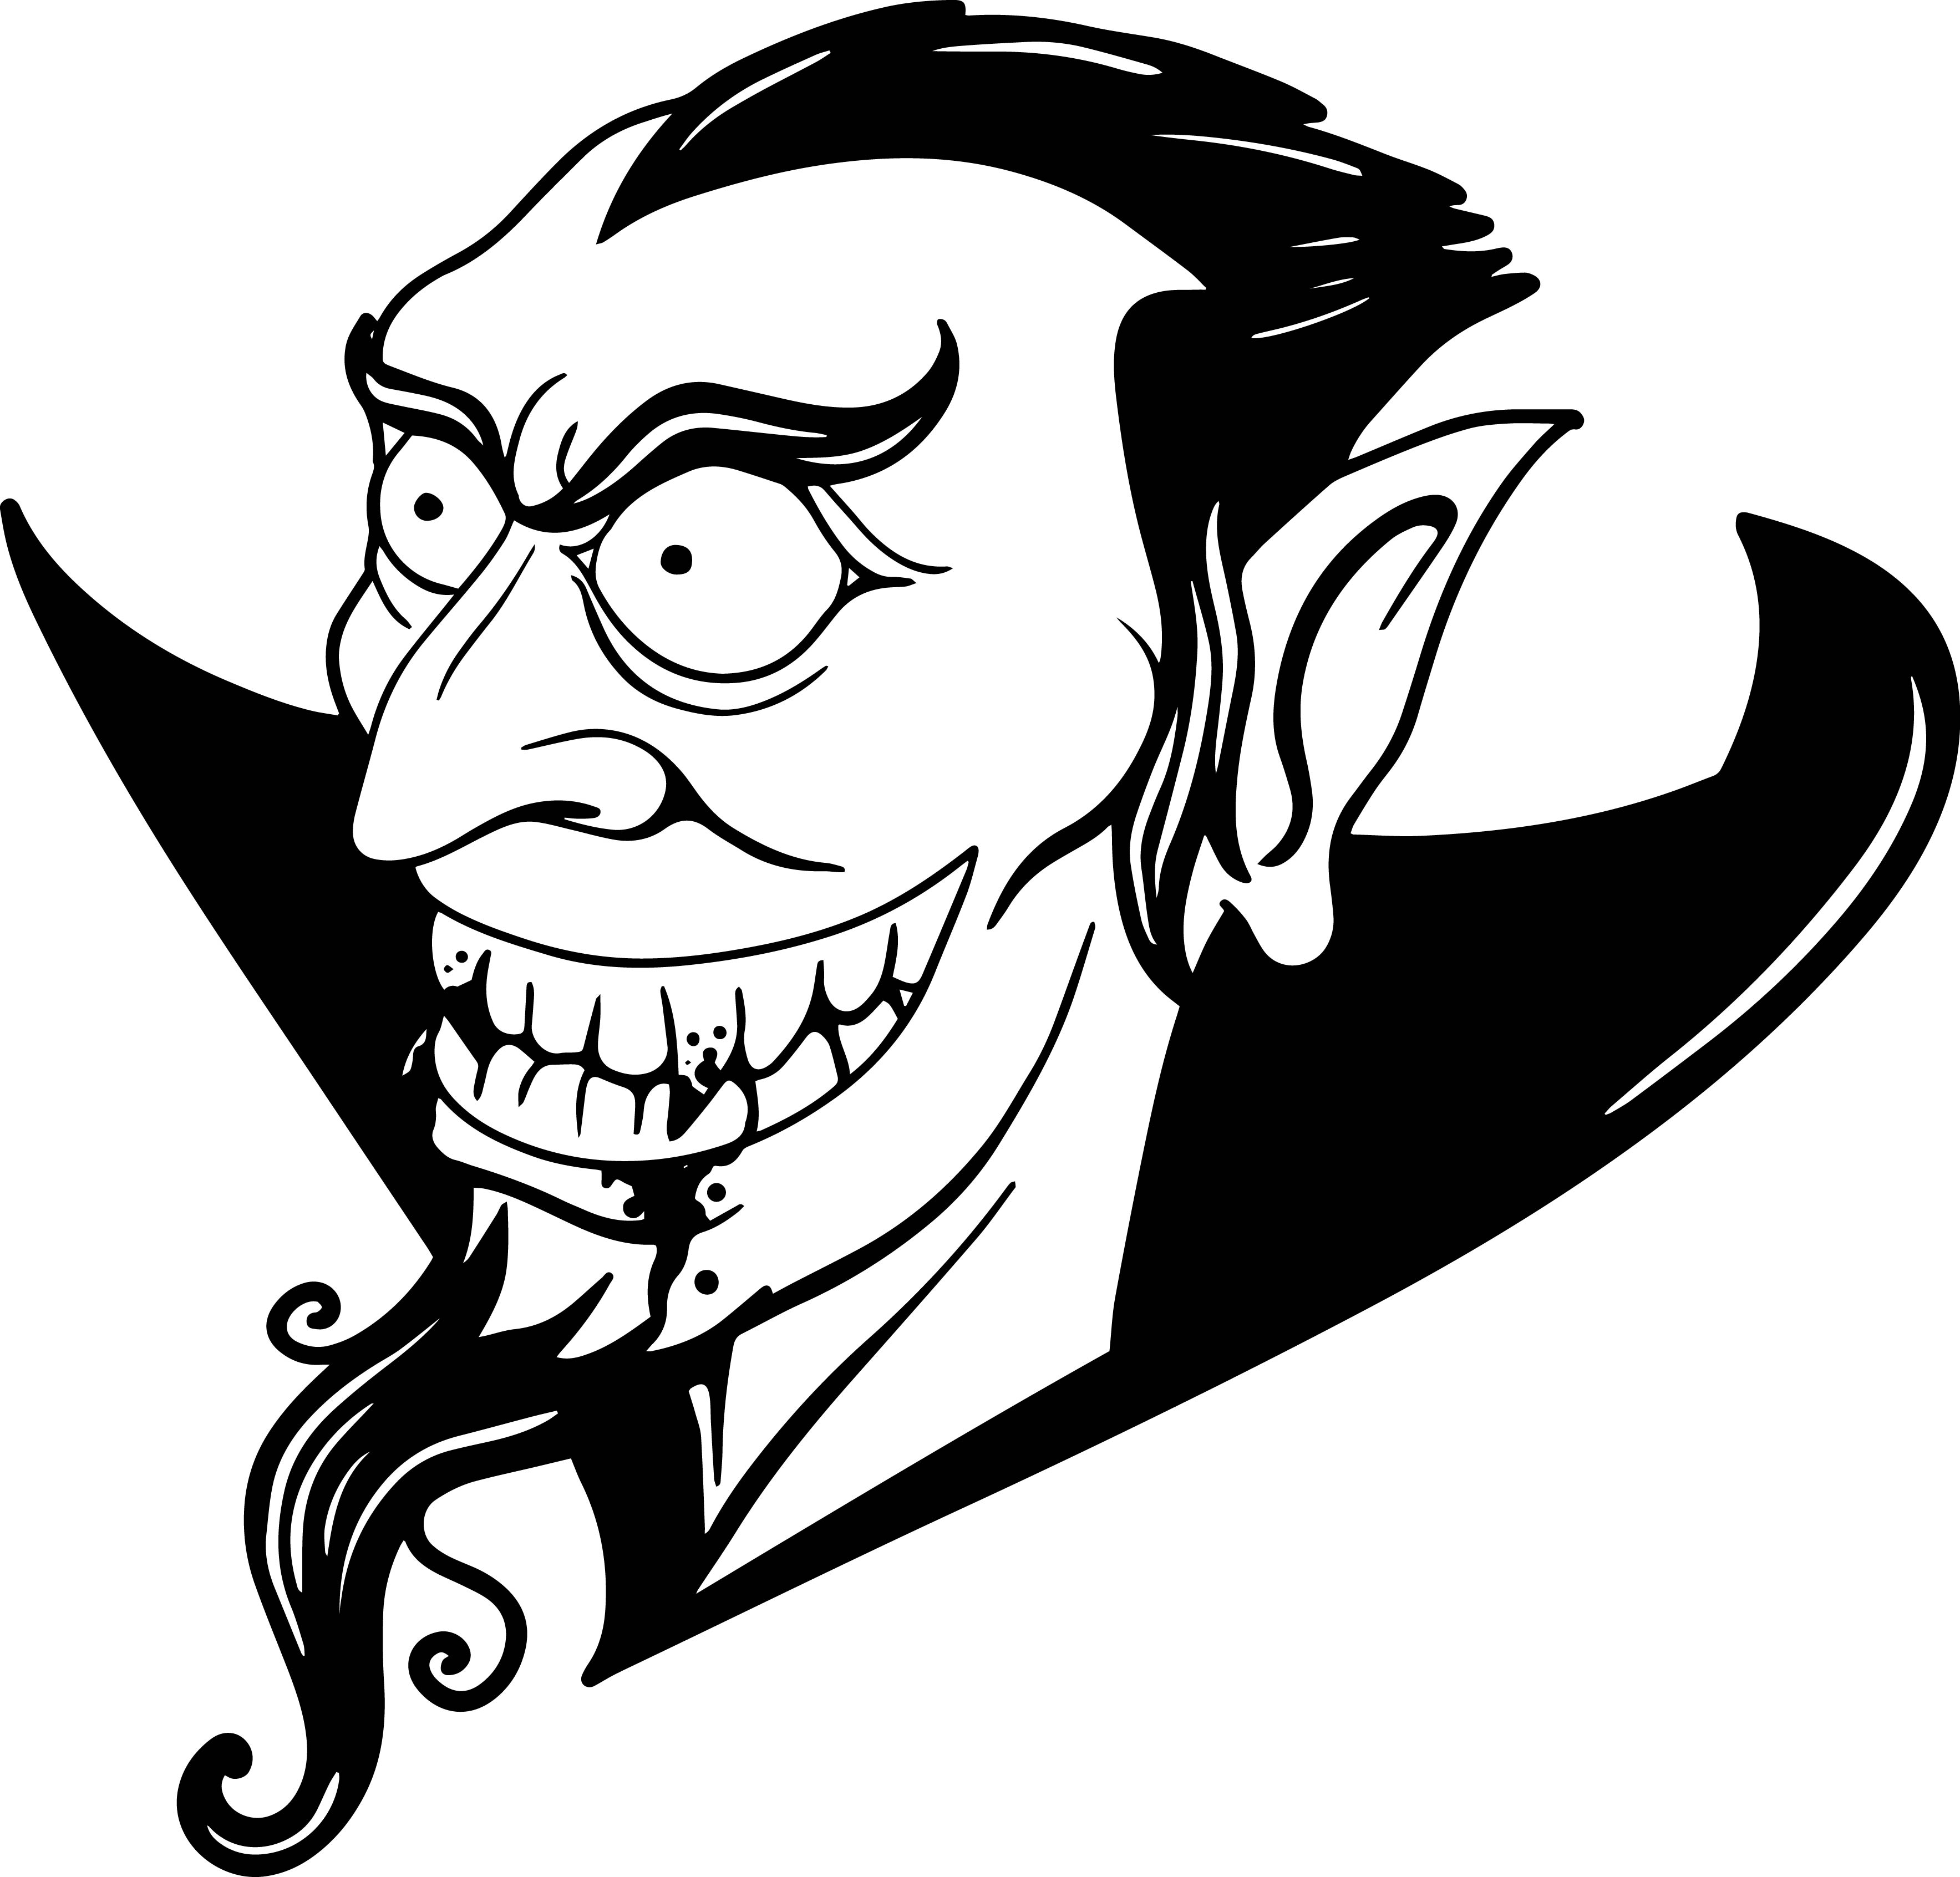 Vampire Head Coloring Page